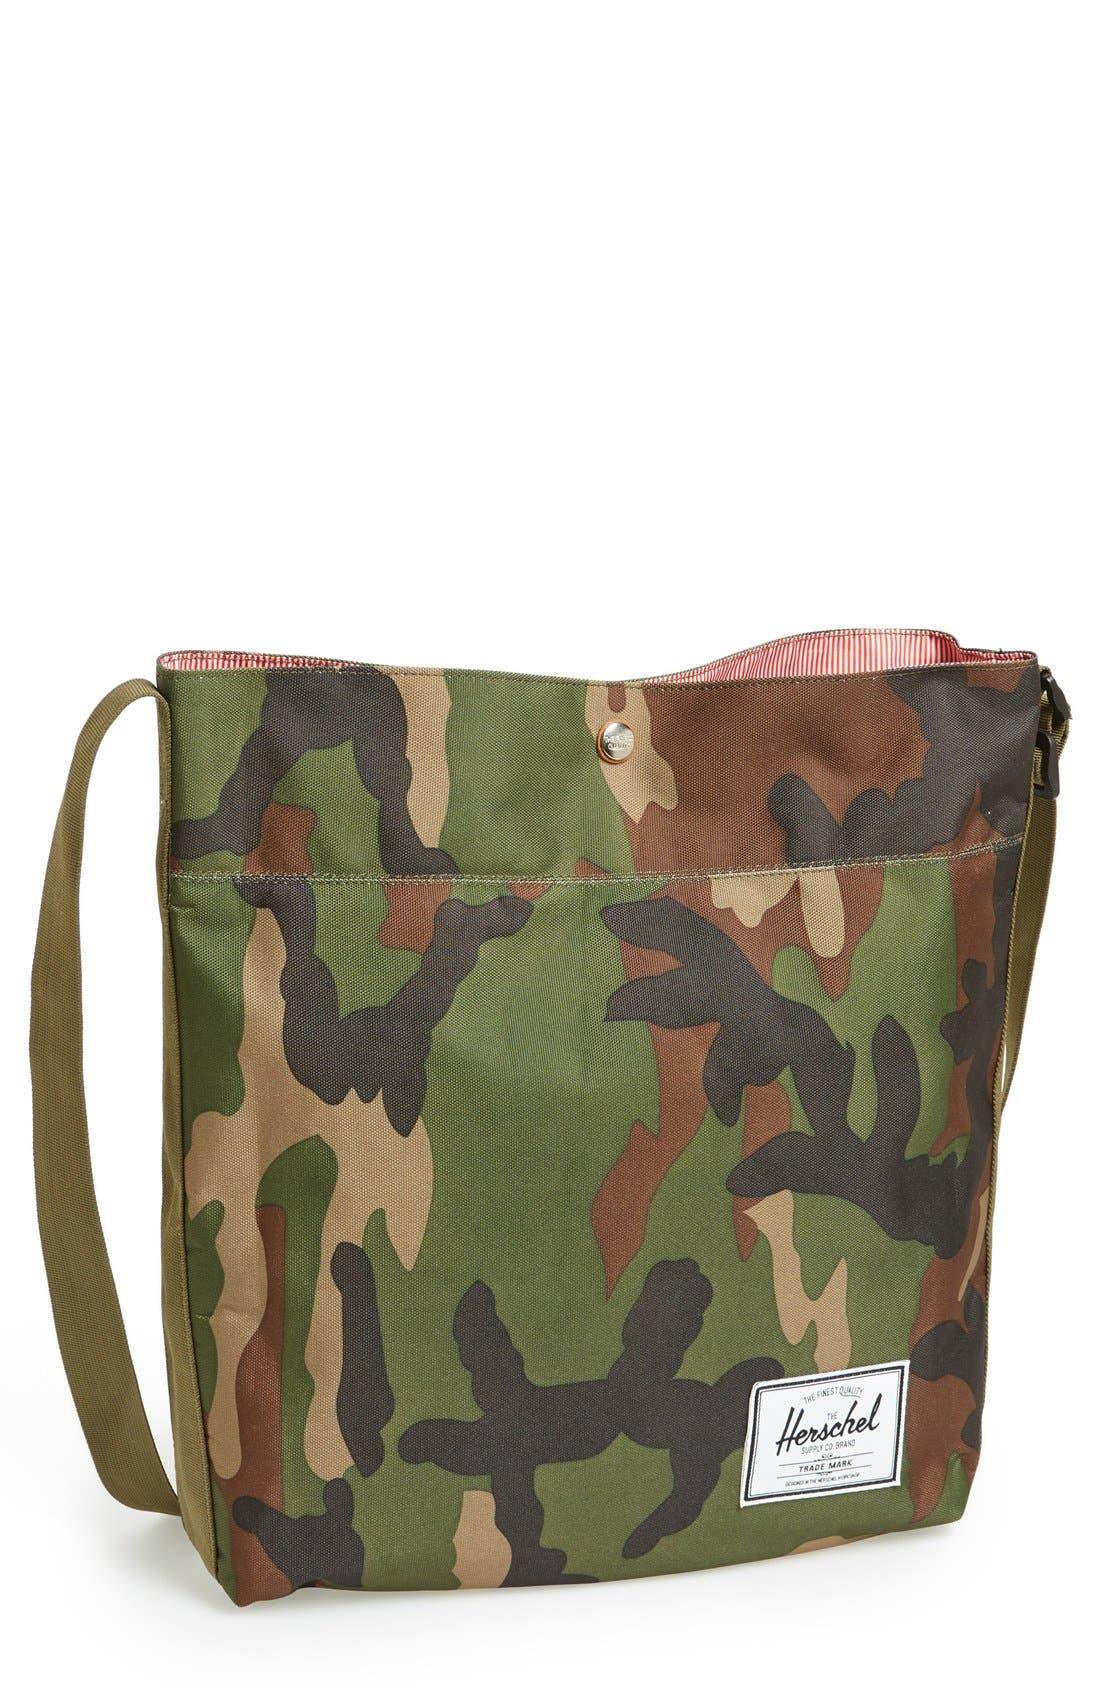 Alternate Image 1 Selected - Herschel Supply Co. 'Ottawa' Camo Tote Bag